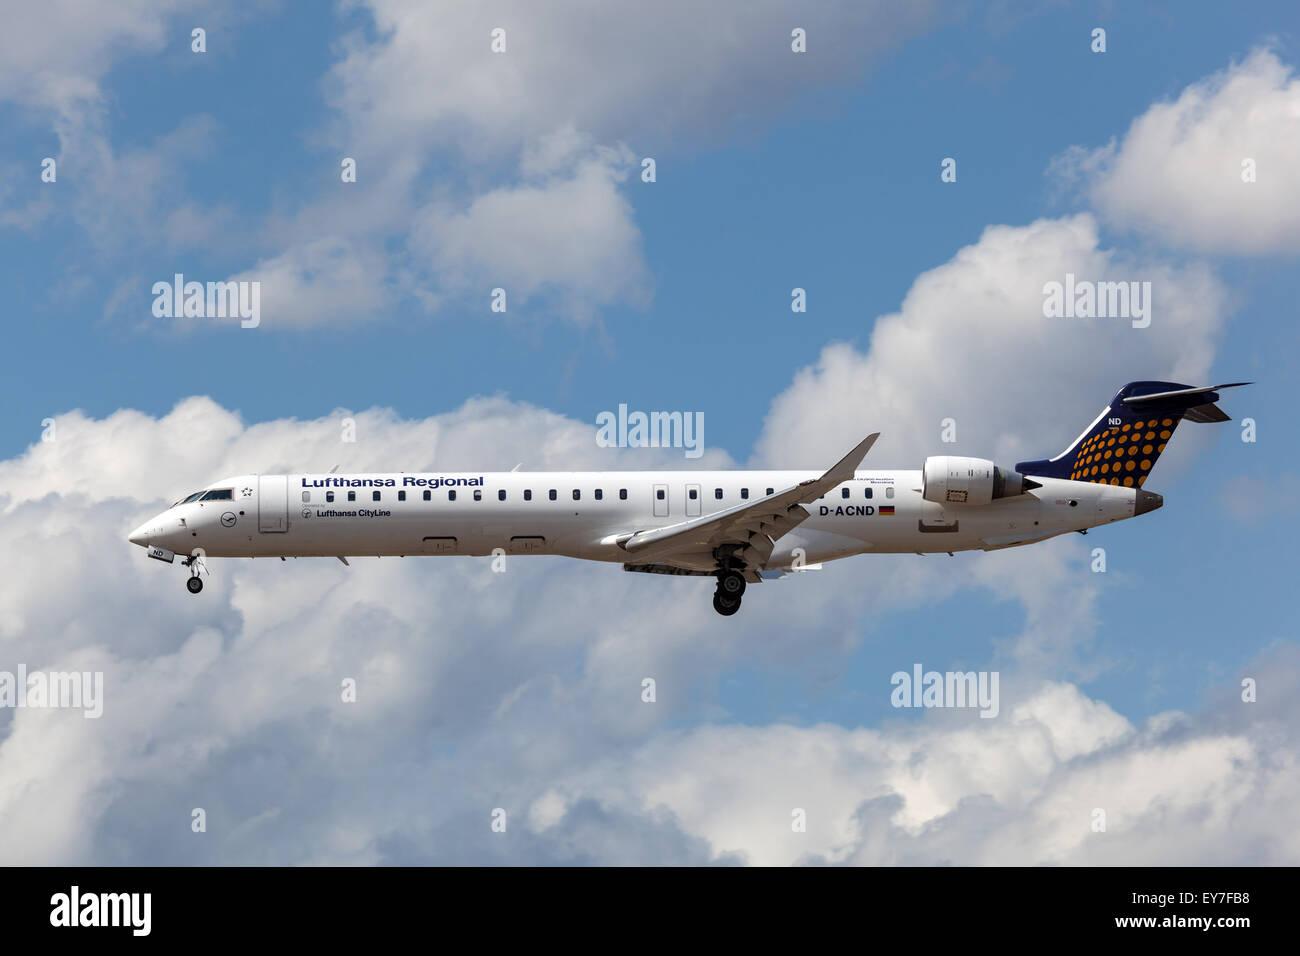 Lufthansa Regional Bombardier CRJ900 NextGen landing at the Frankfurt International Airport - Stock Image